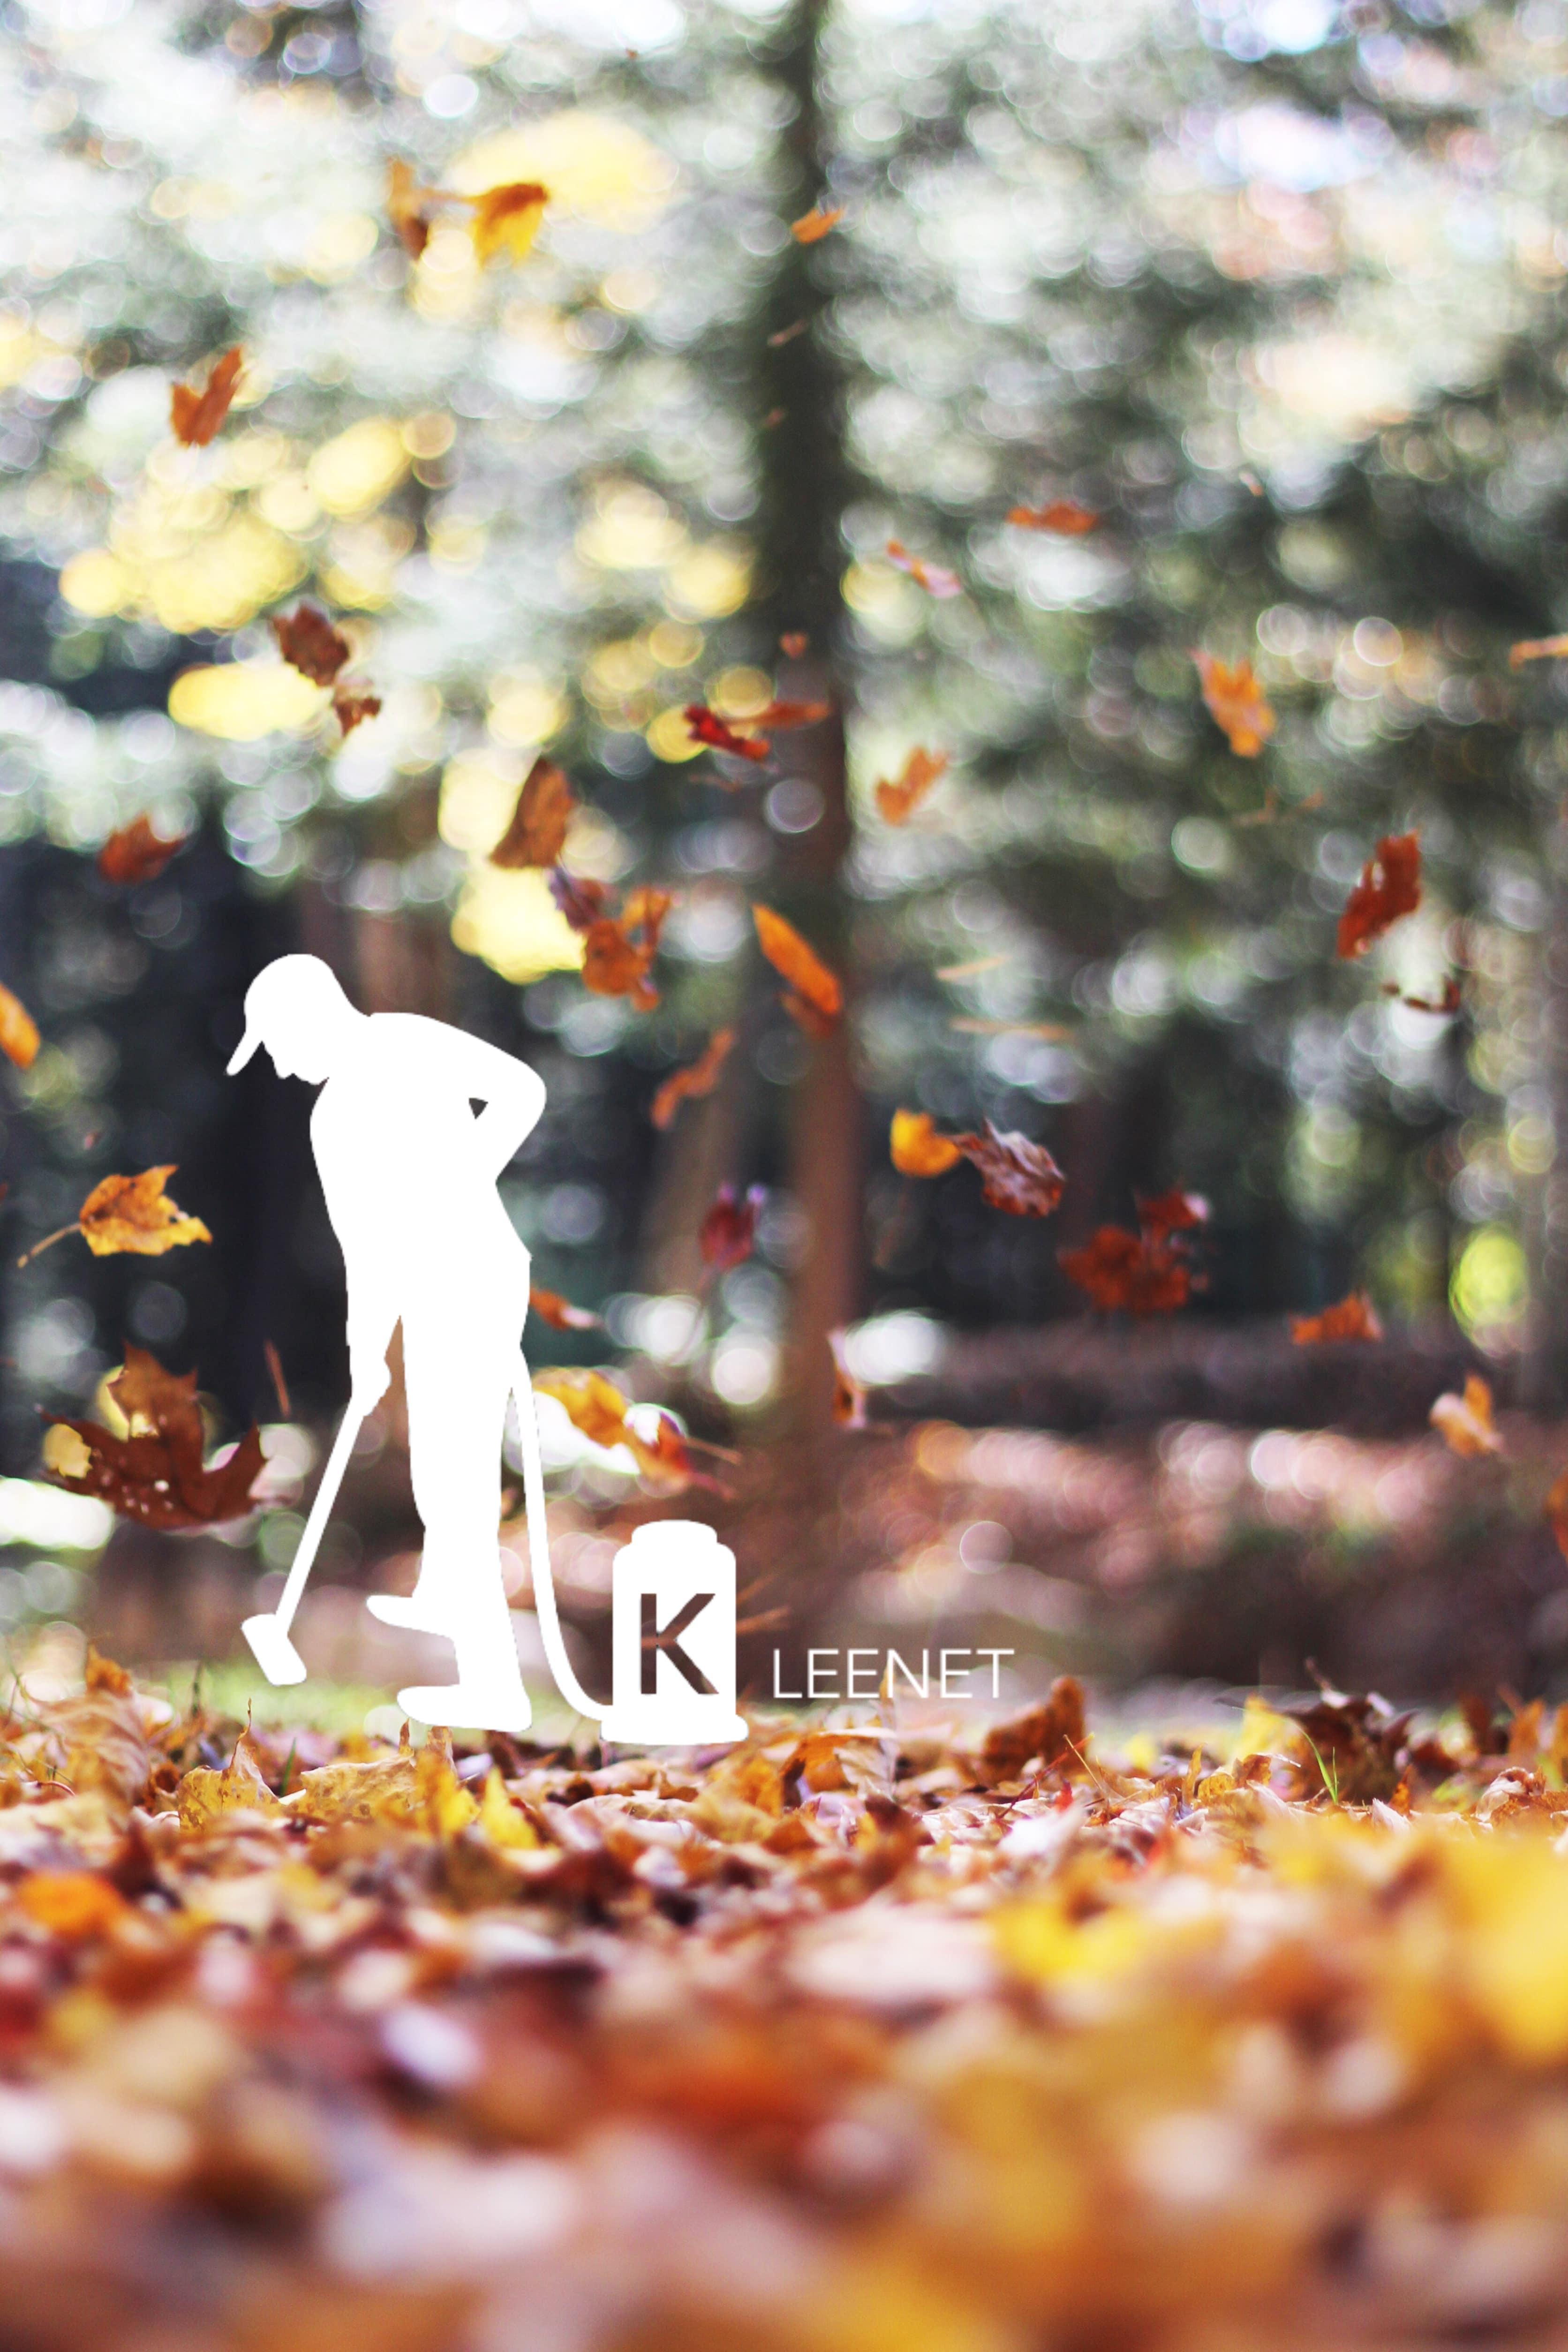 Kleenet Autumn Special